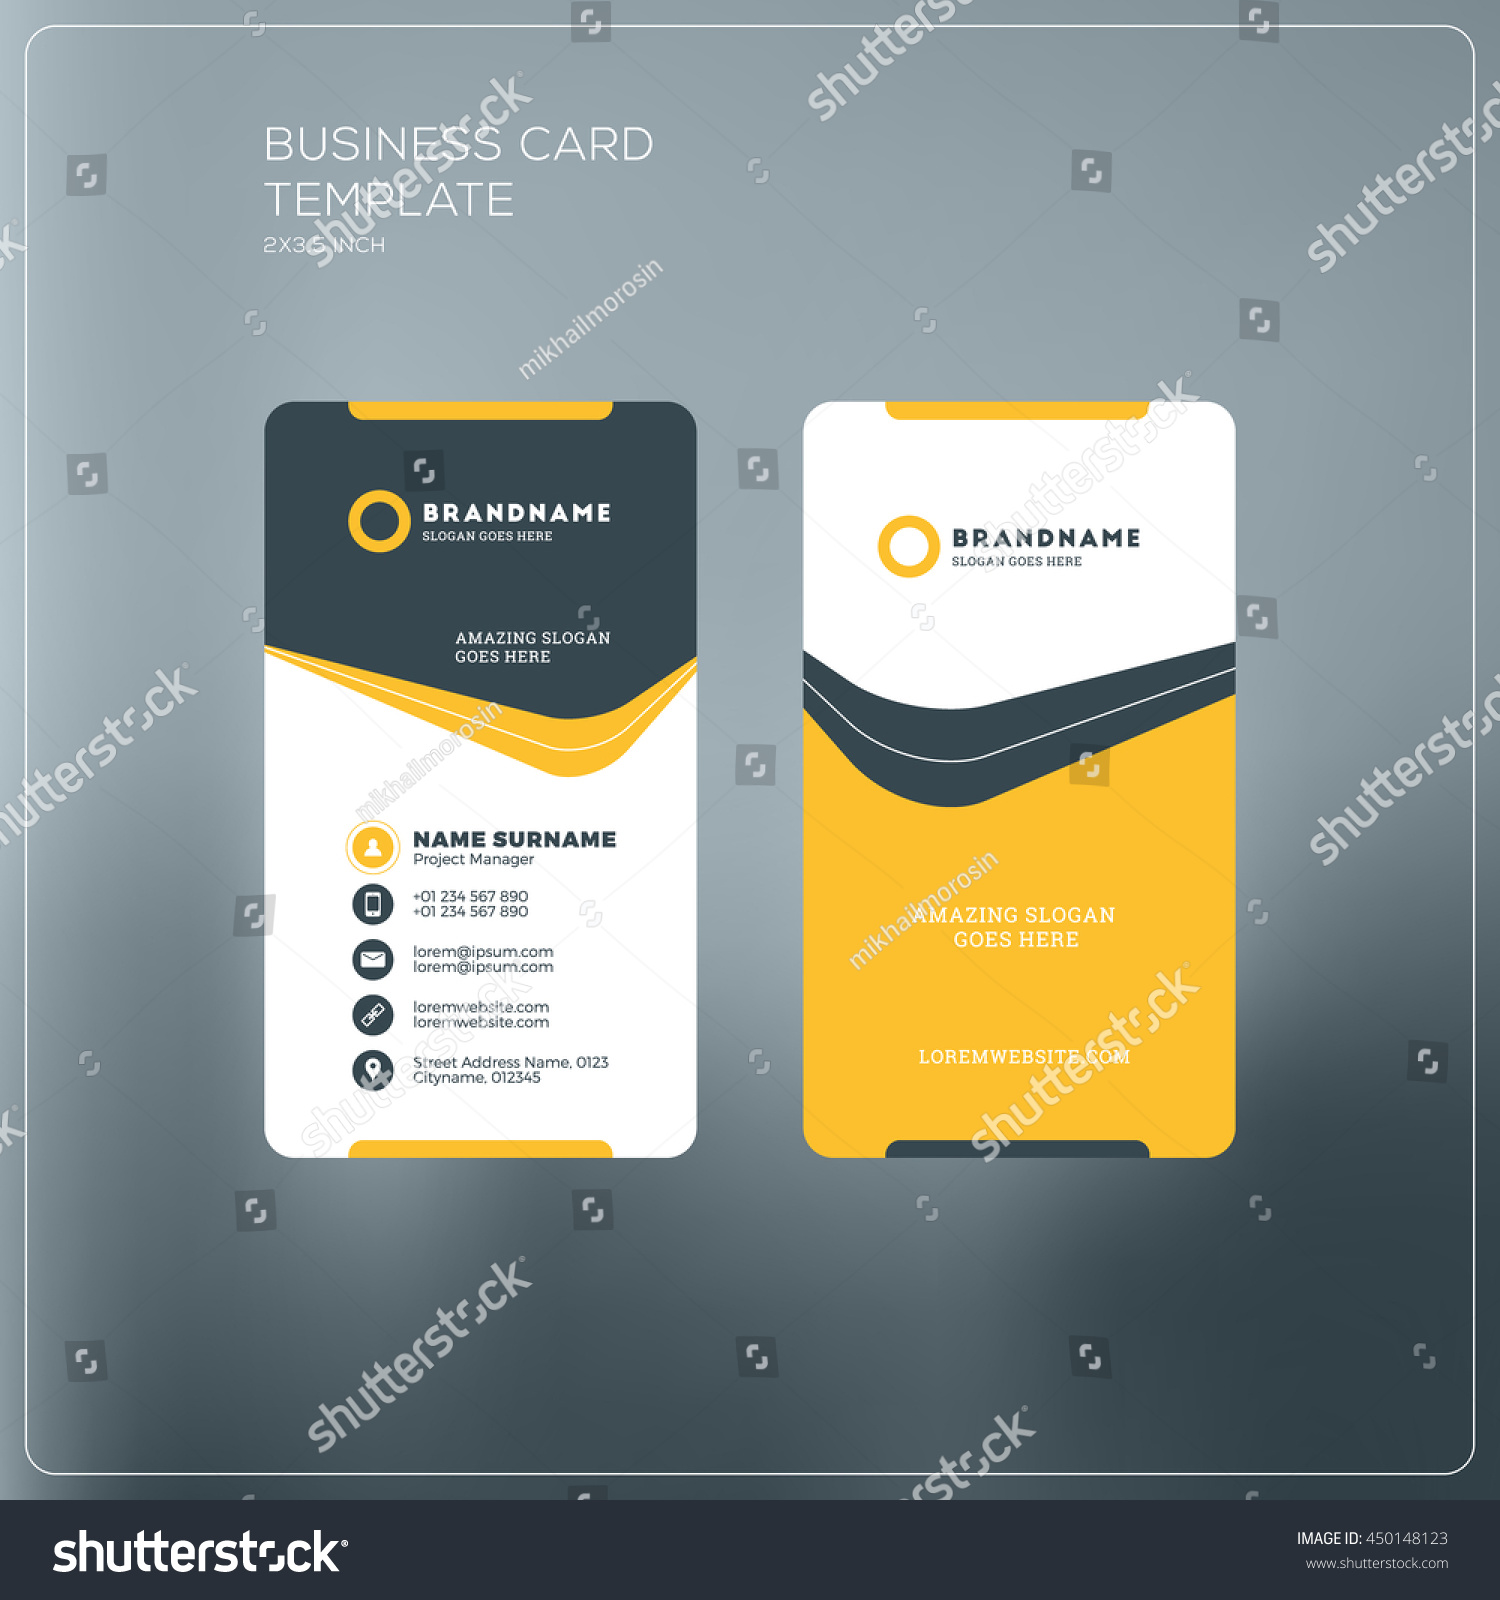 vertical business card print template personal stock vector 450148123 shutterstock. Black Bedroom Furniture Sets. Home Design Ideas